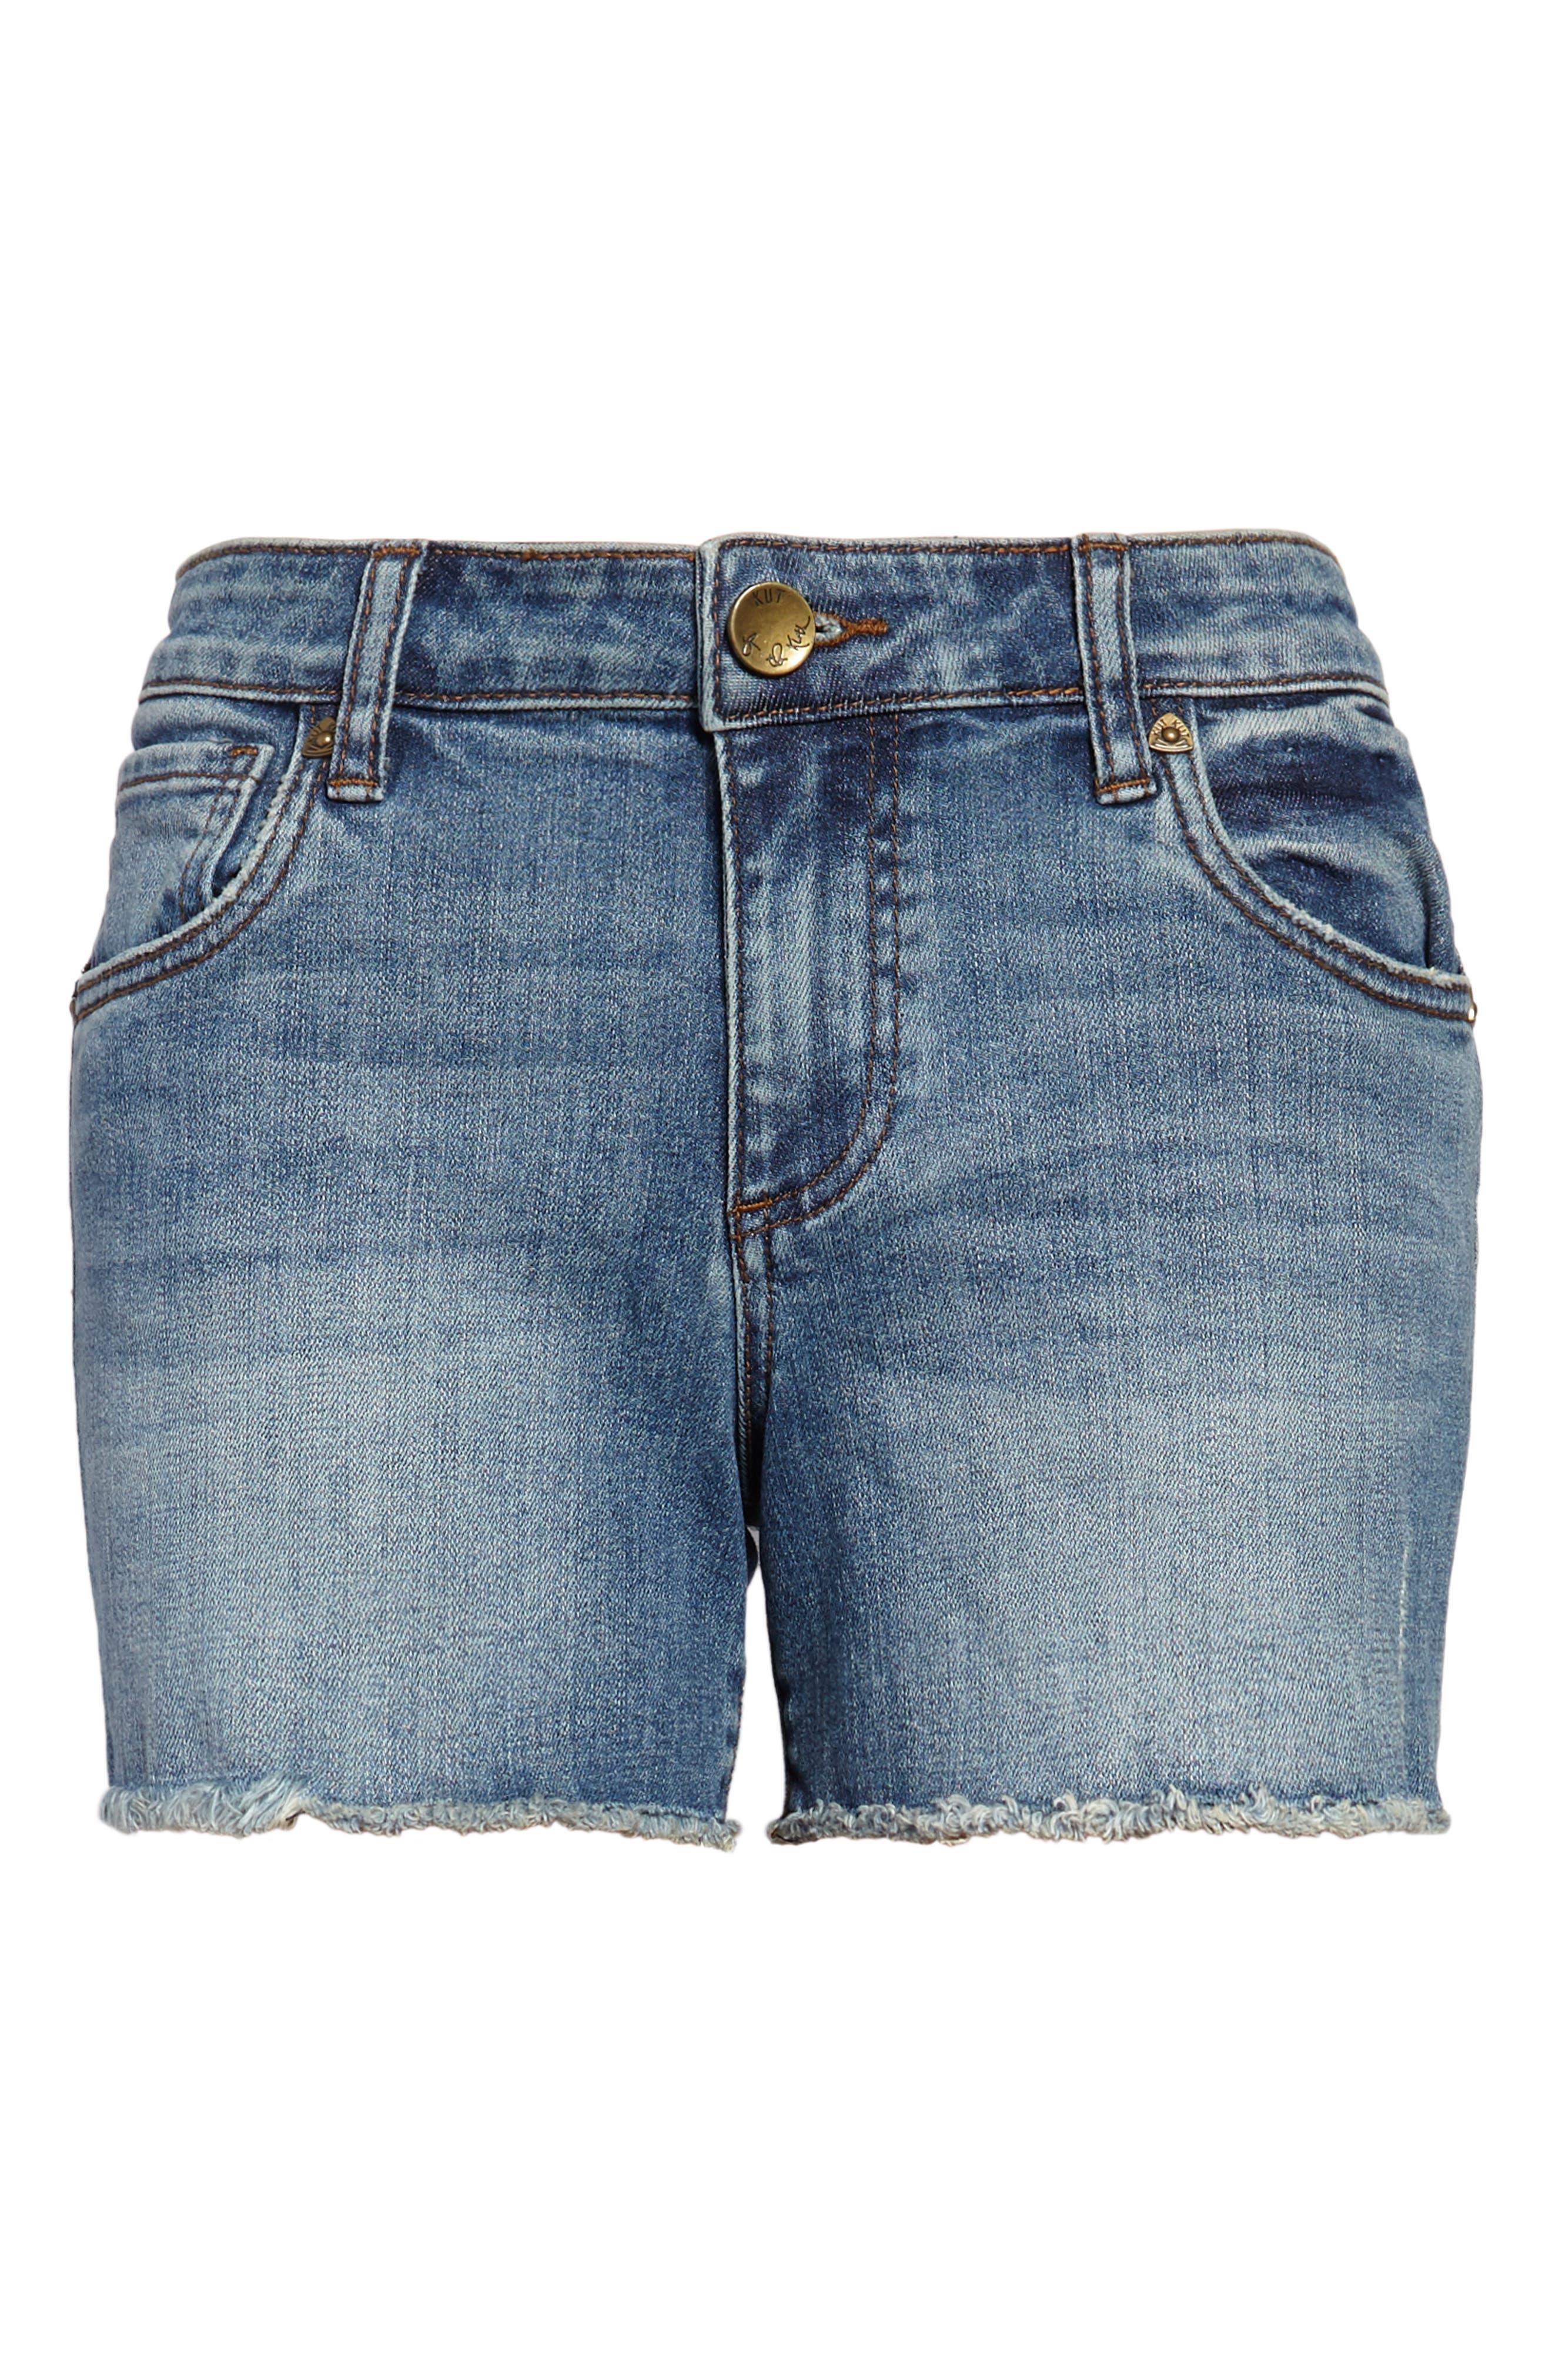 Gidget Denim Shorts,                             Alternate thumbnail 7, color,                             CONSOLIDATED